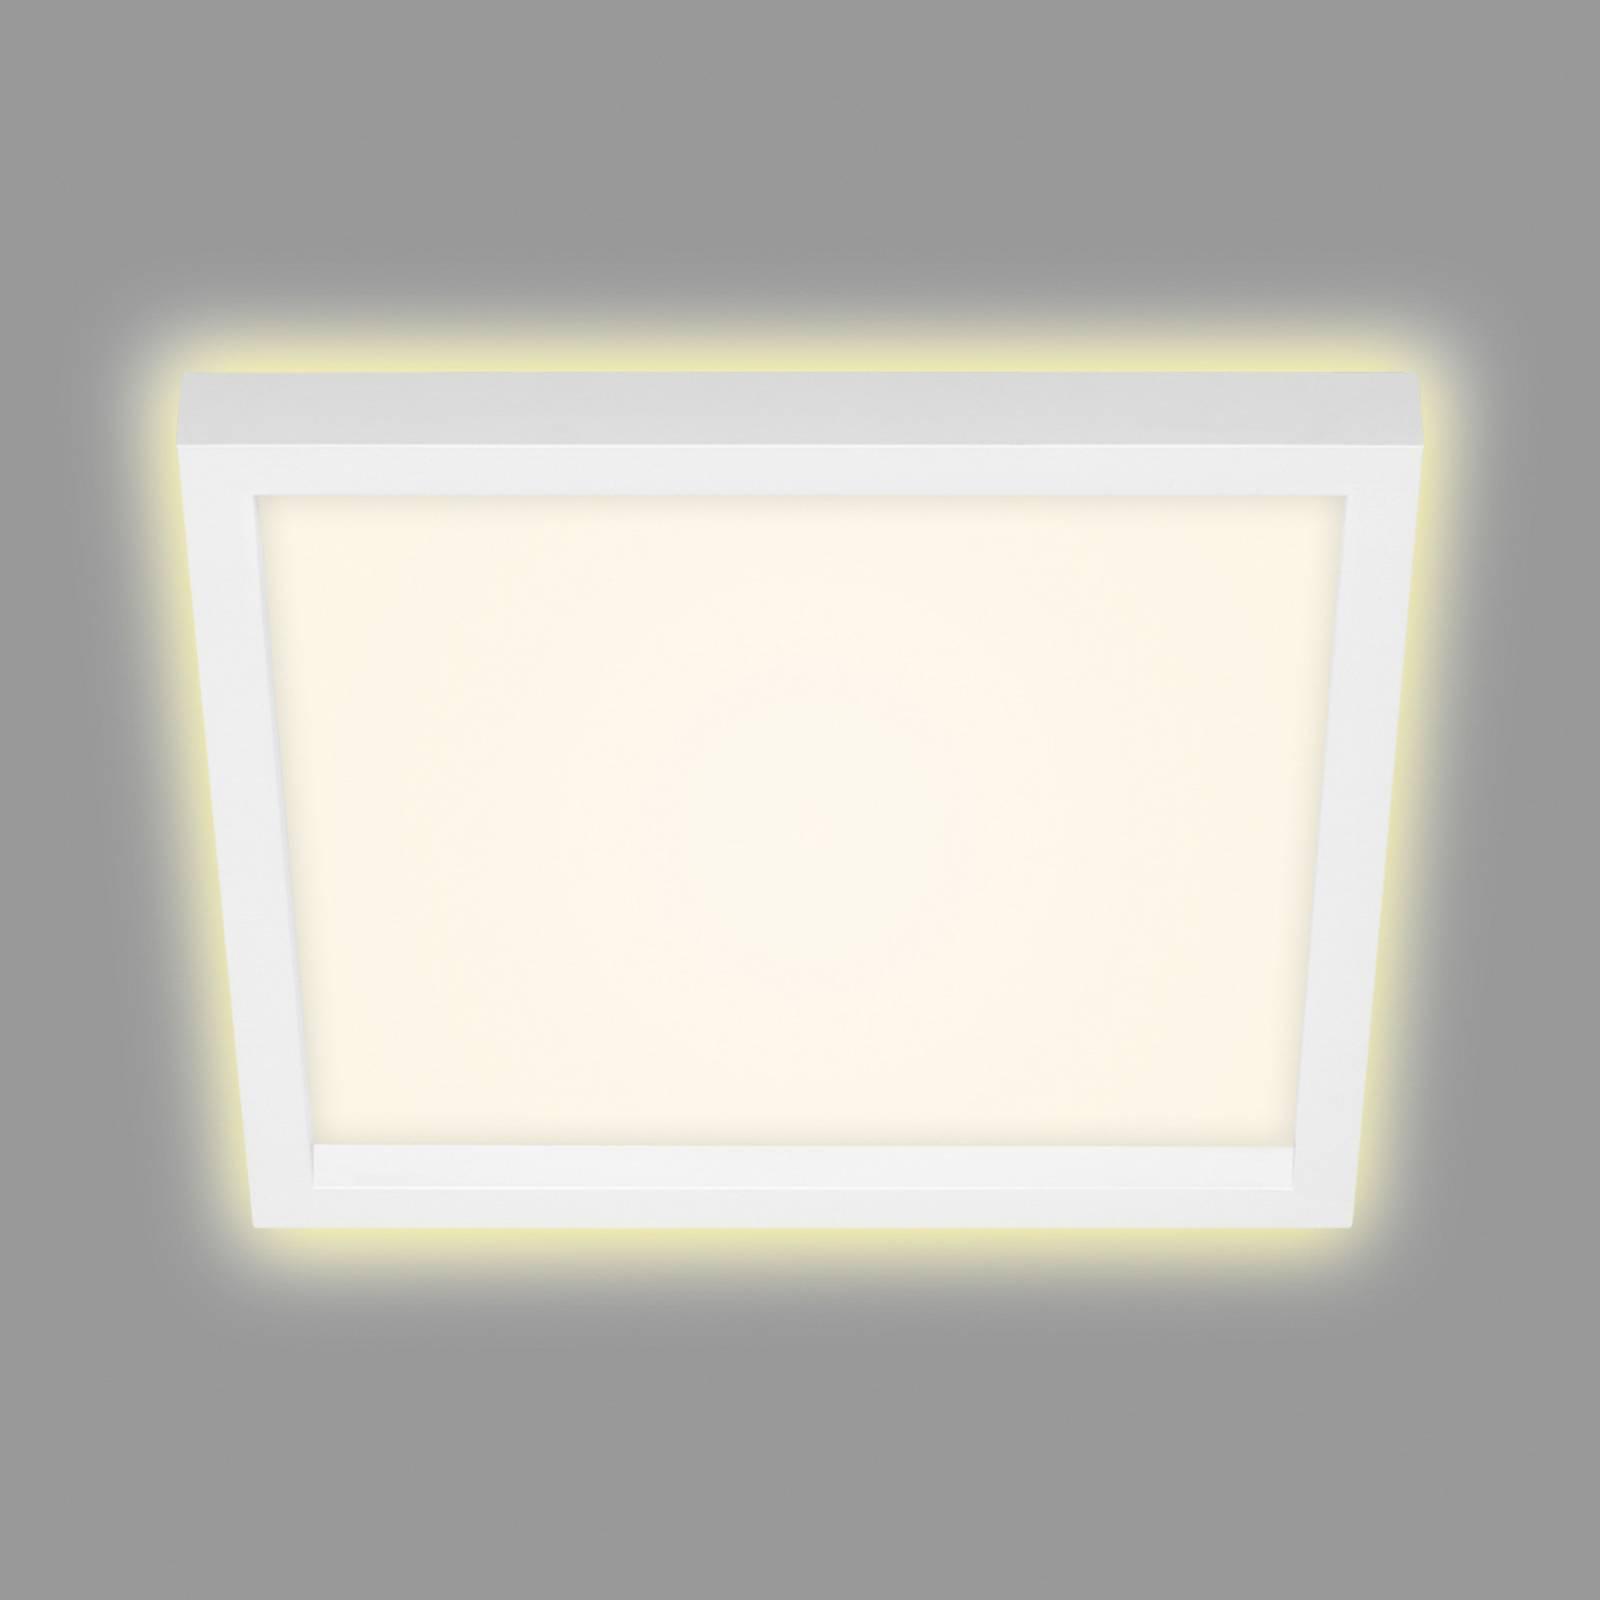 Lampa sufitowa LED 7362, 29 x 29 cm, biała